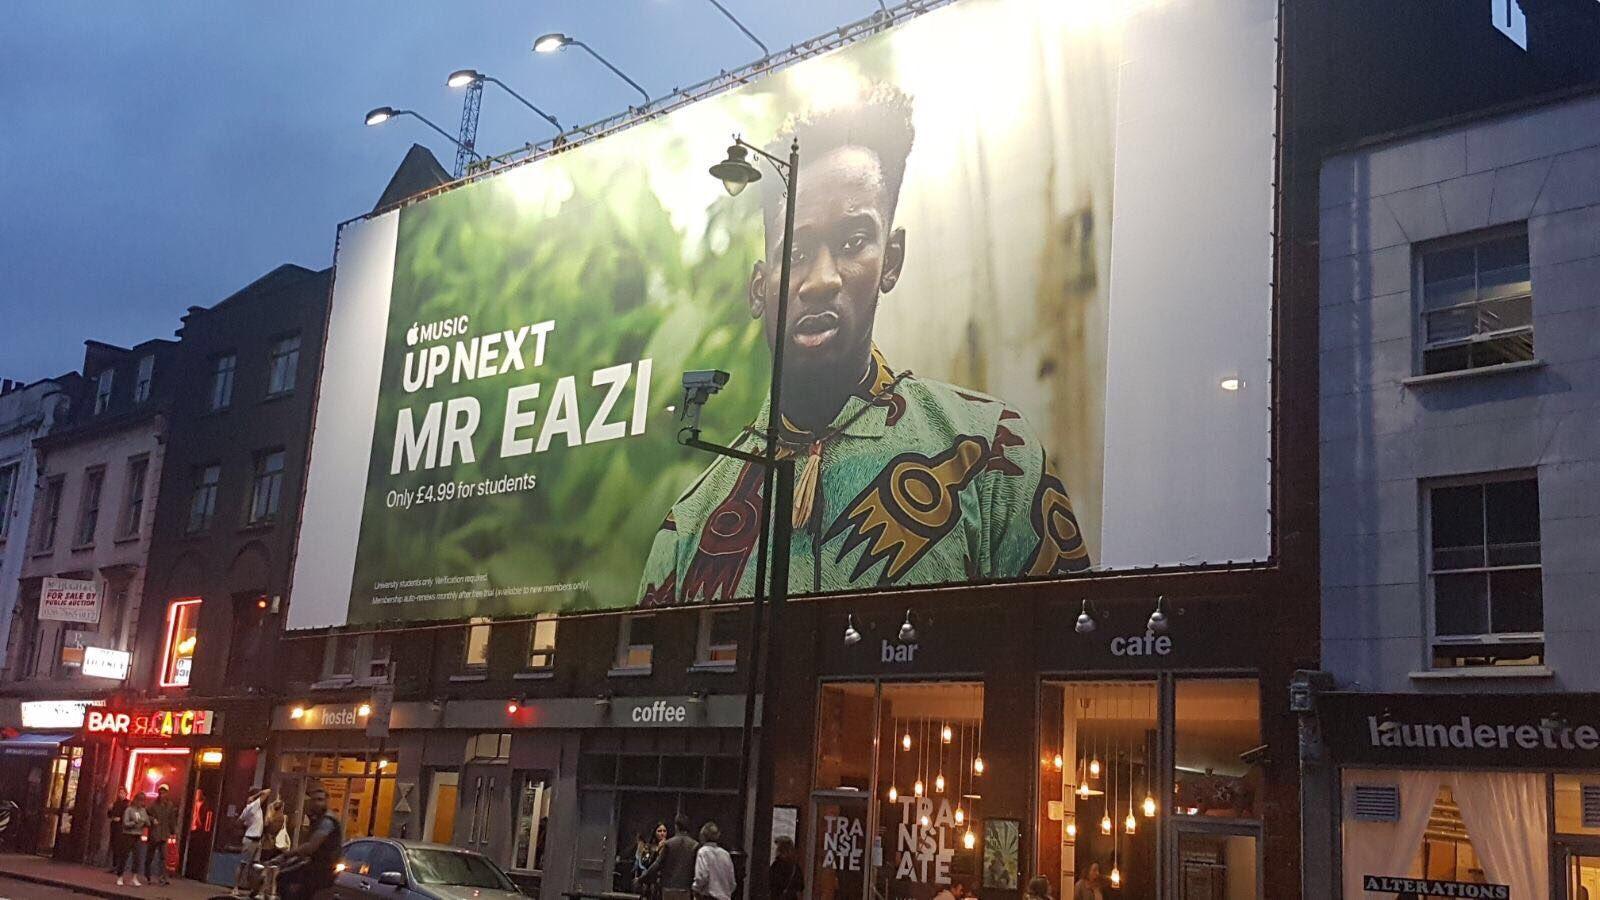 MR EAZI2